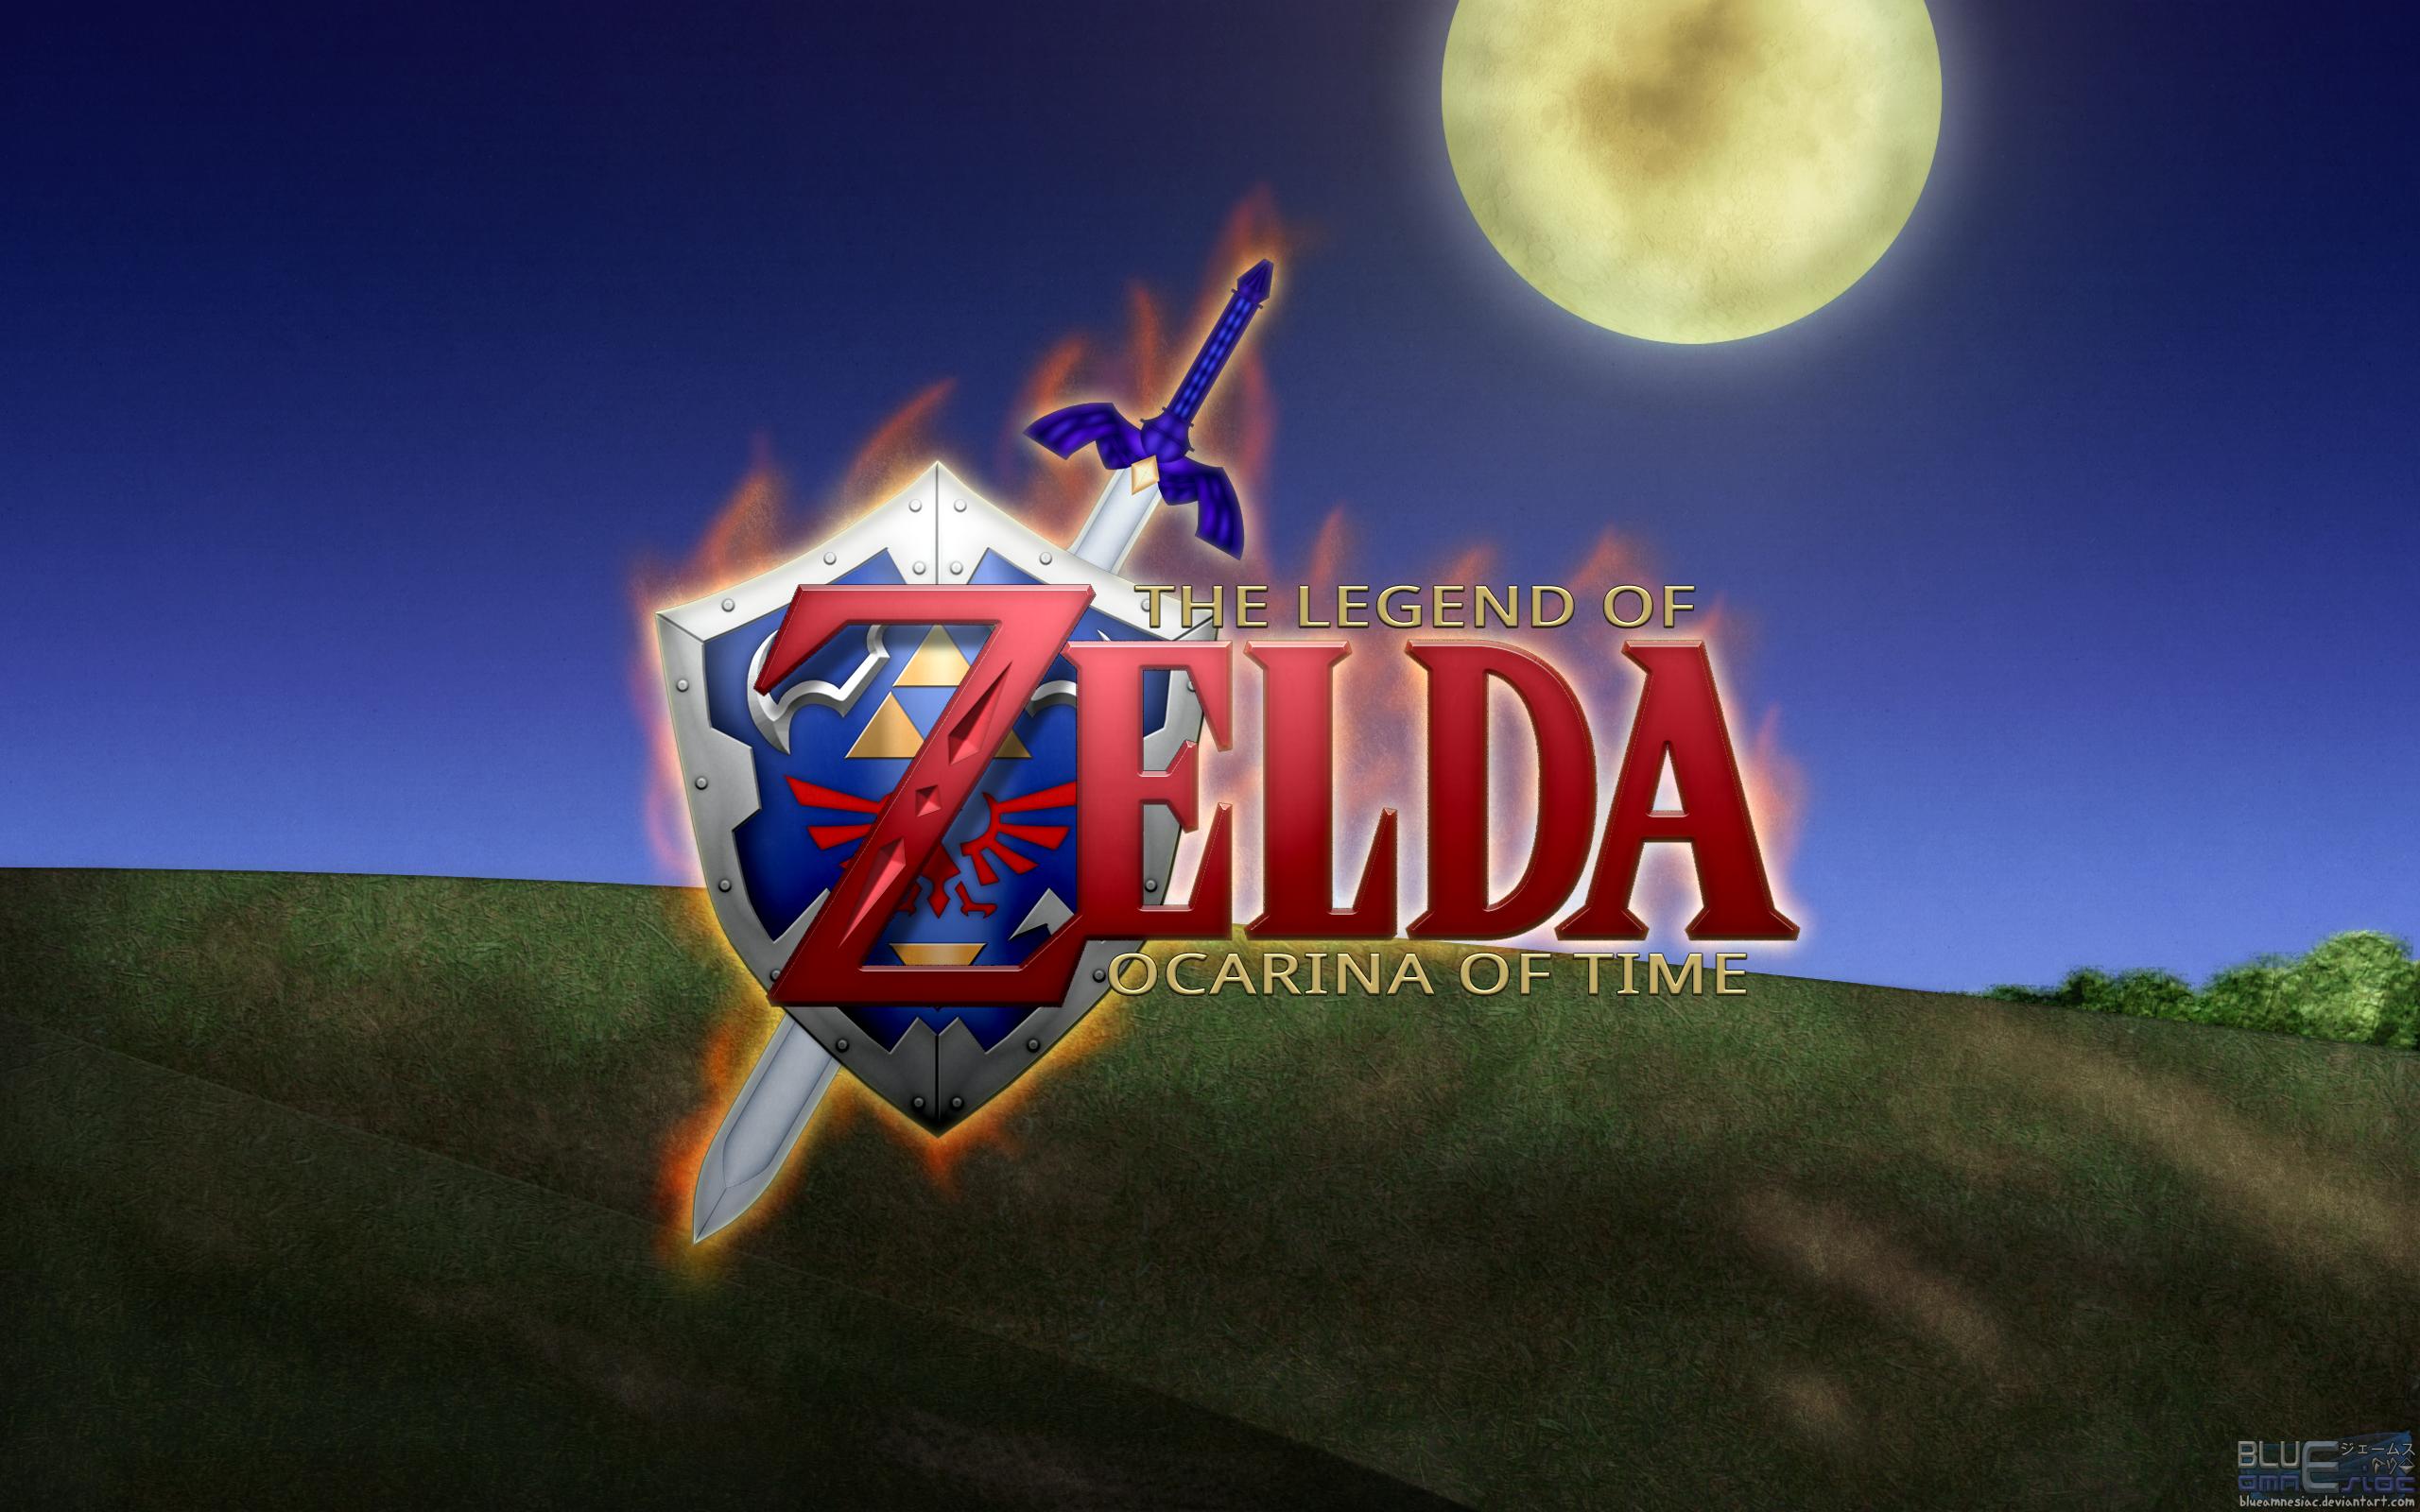 The Legend of Zelda : Ocarina of Time sous Unreal Engine 4